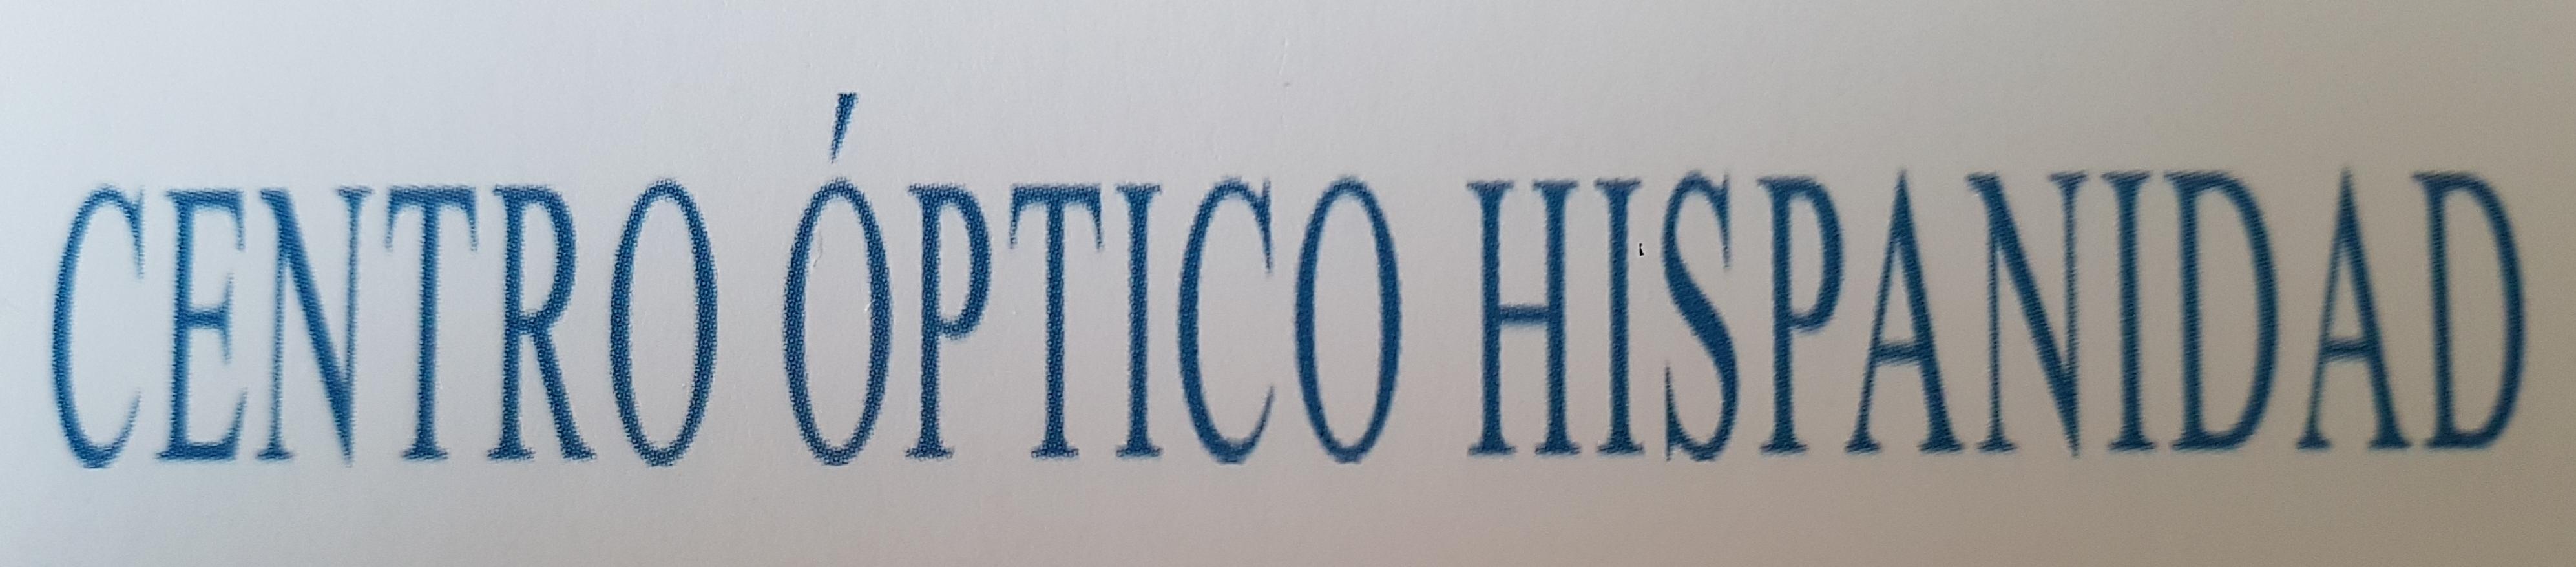 CENTRO OPTICO HISPANIDAD